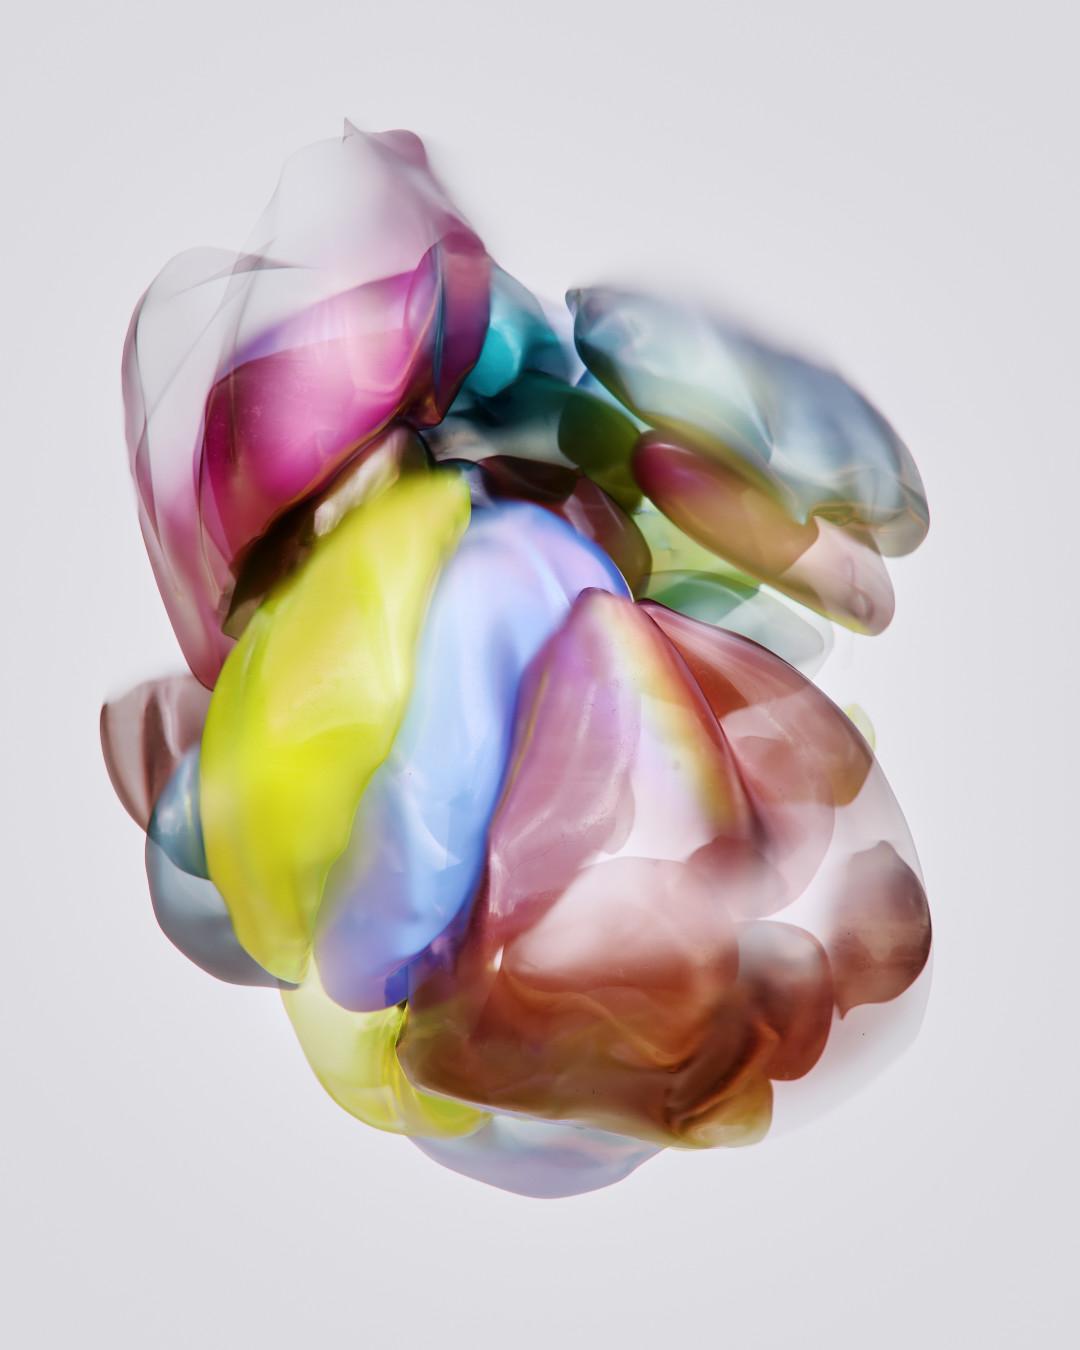 Colorclouds_10_cam1_0001